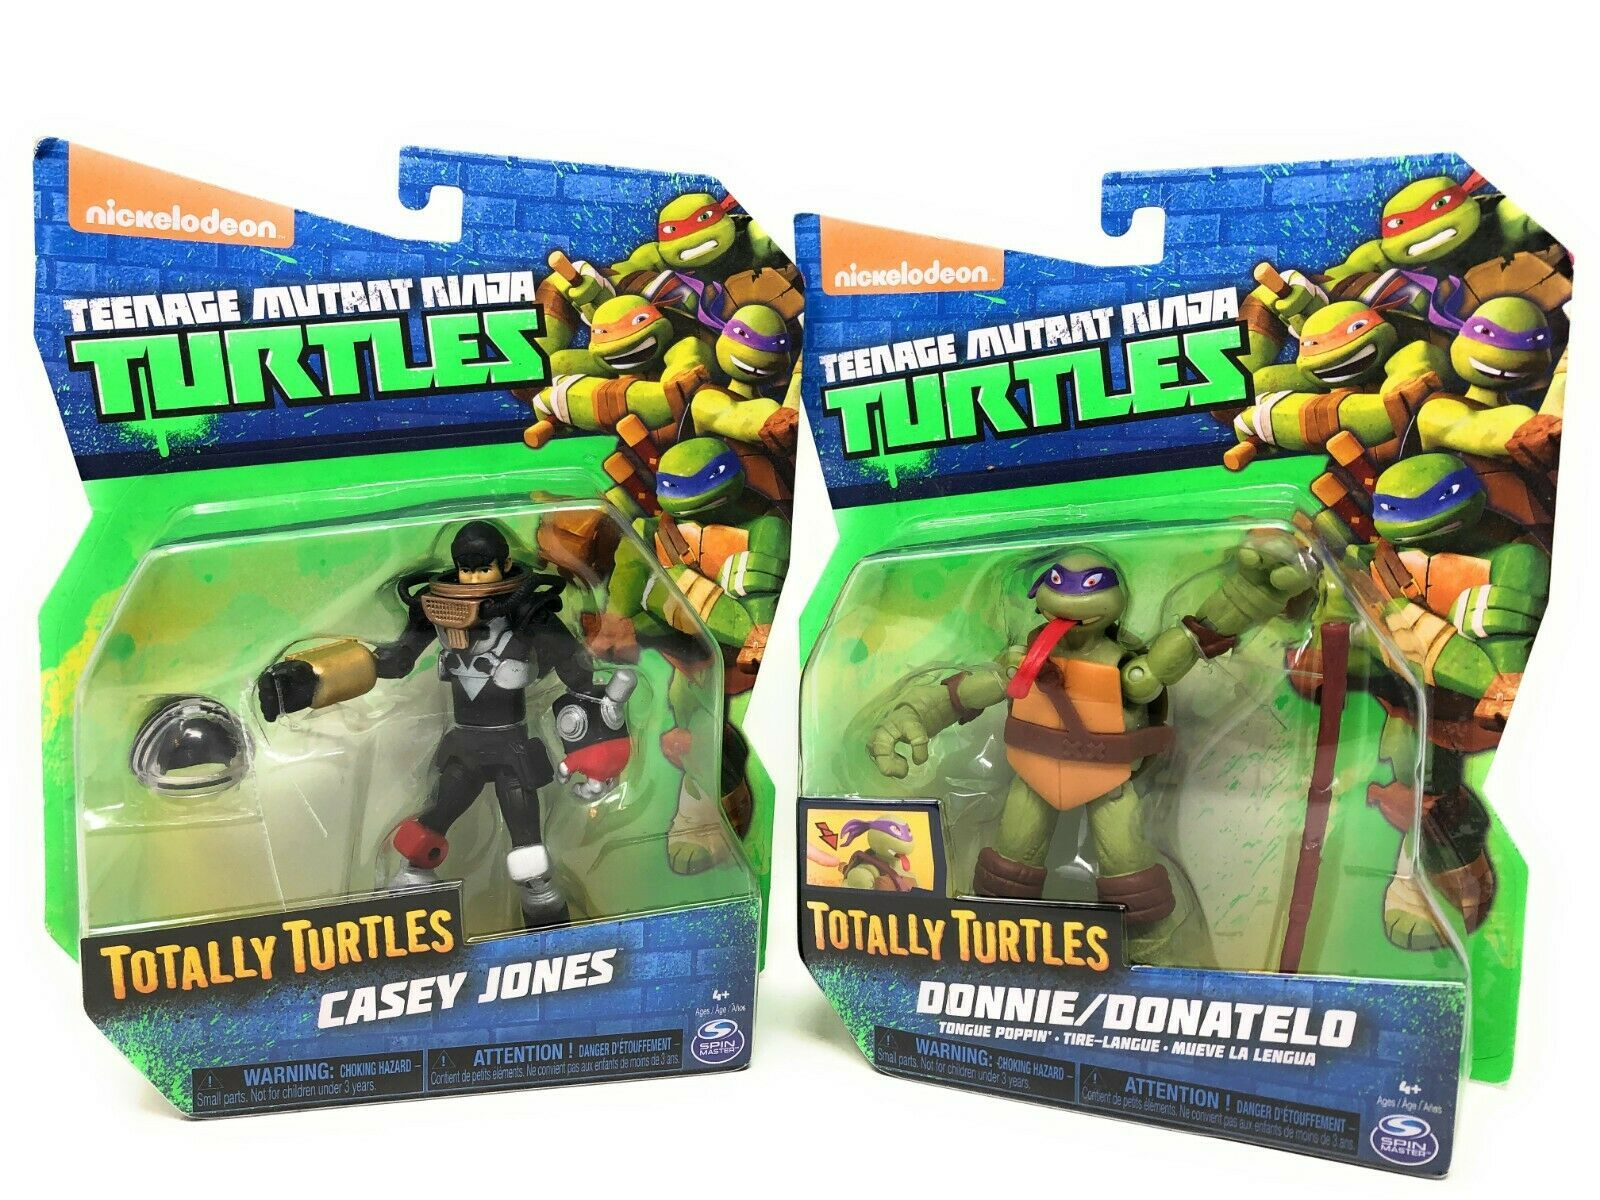 Teenage Mutant Ninja Turtles-Donatelo Tongue Poppin/Casey Jones-Action Figures - $29.99